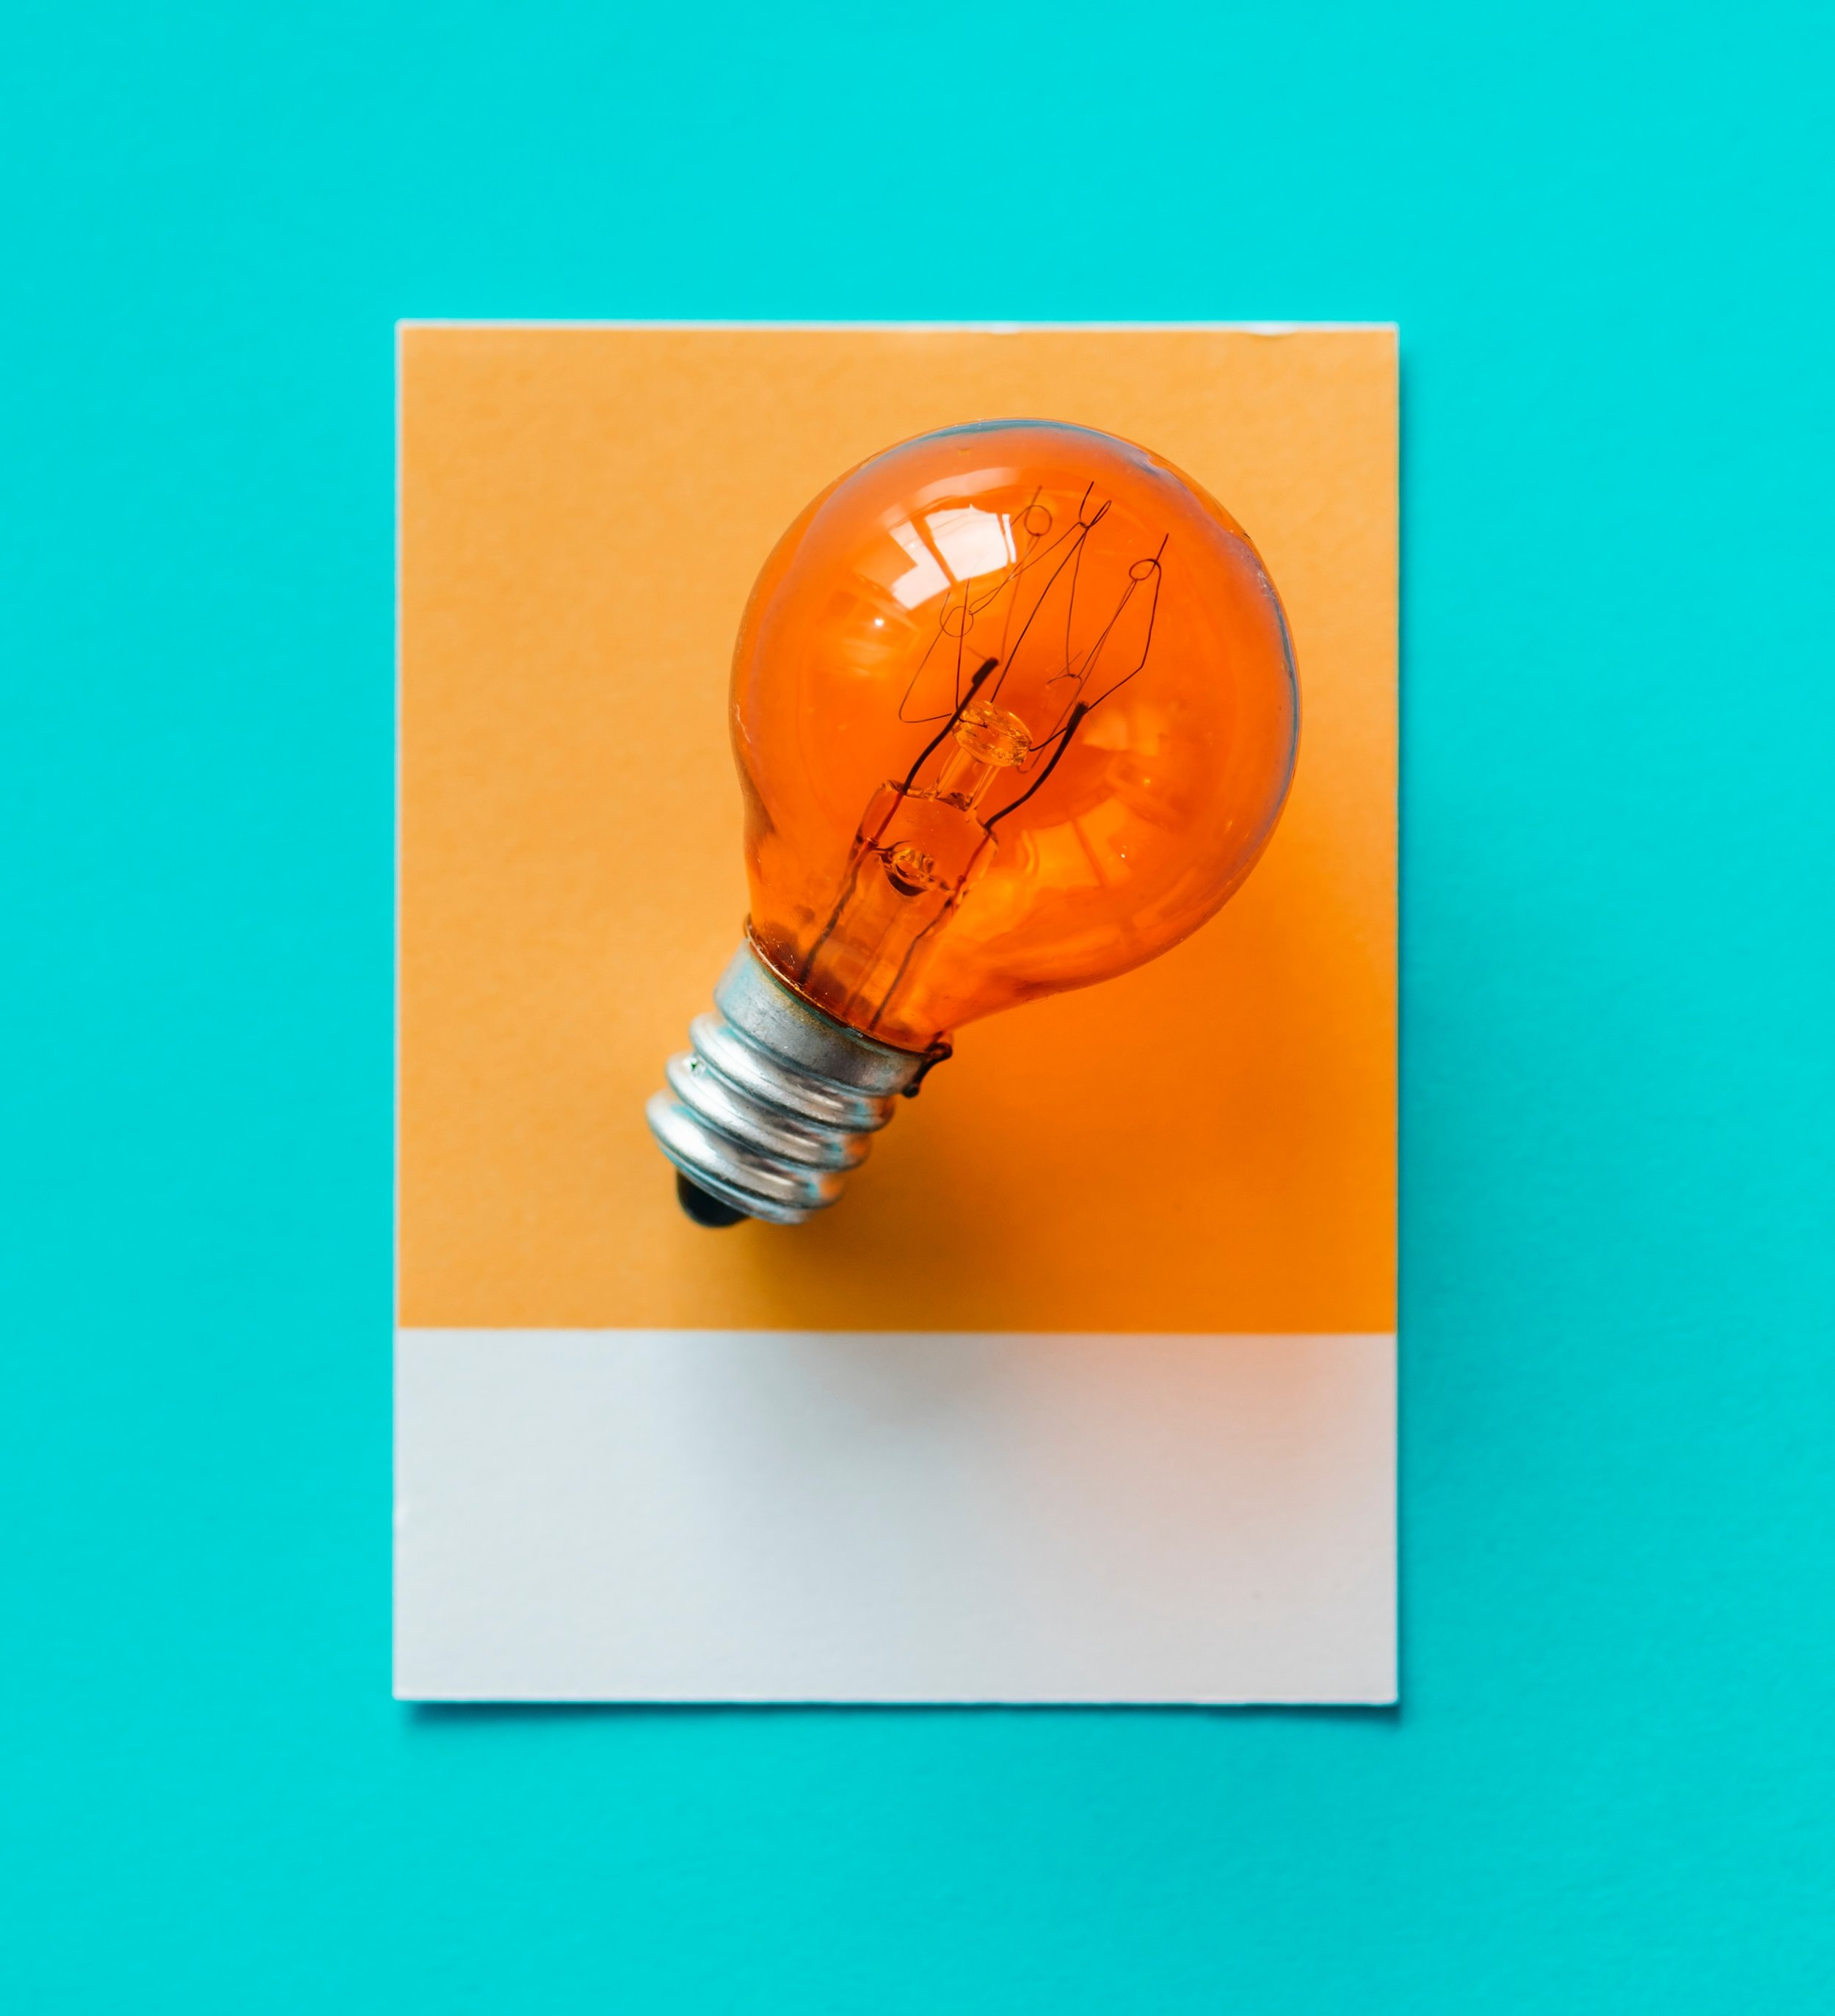 Amber lightbulb on a blue background